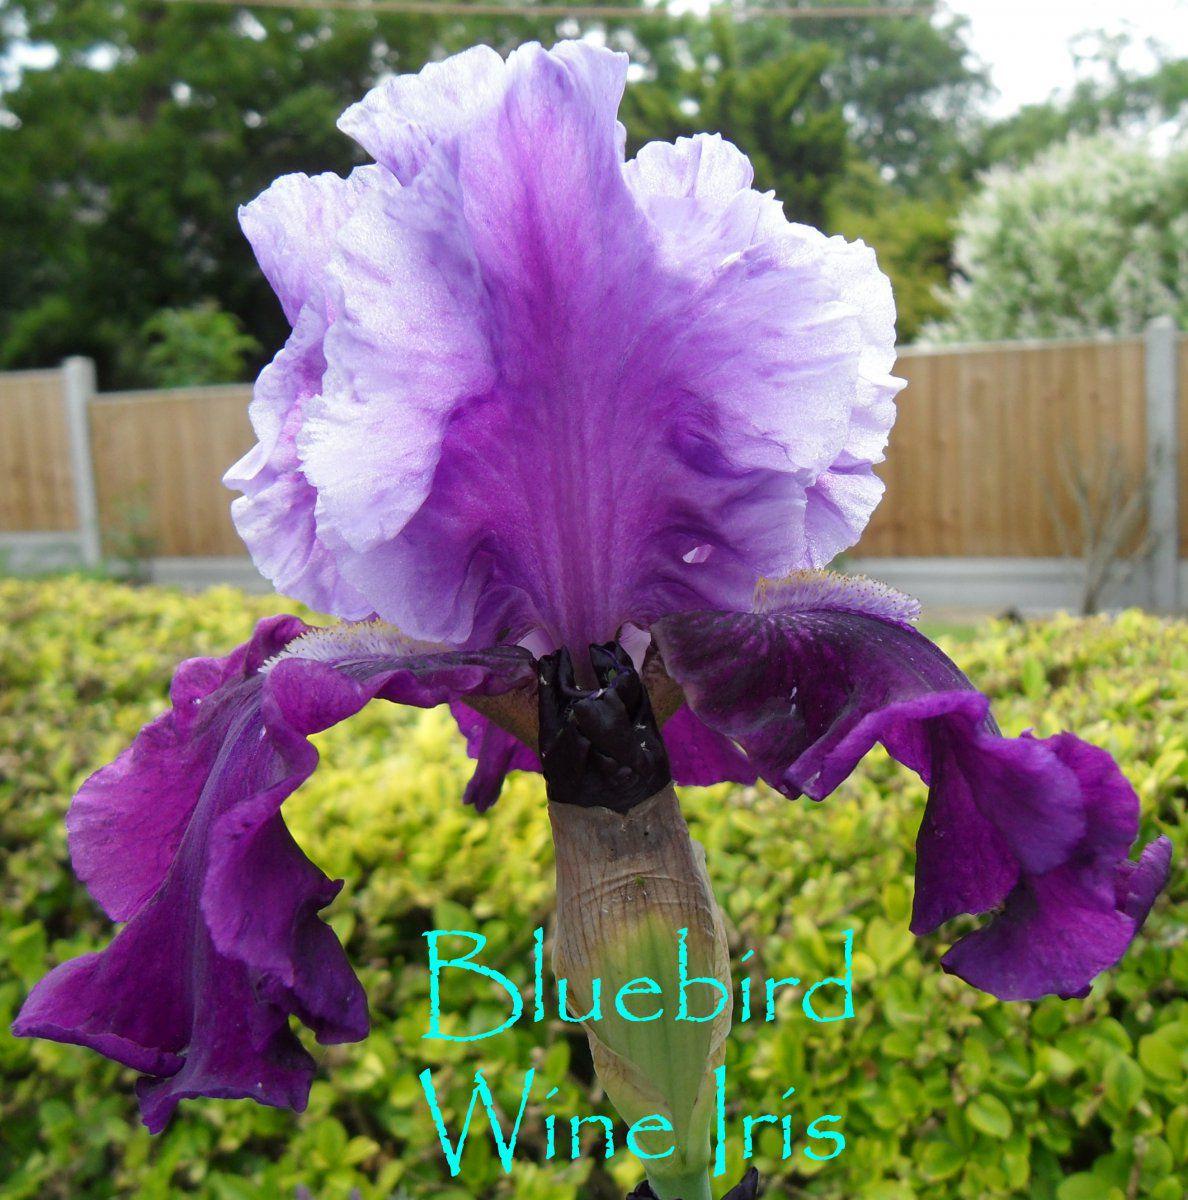 IrisBlueb.jpg